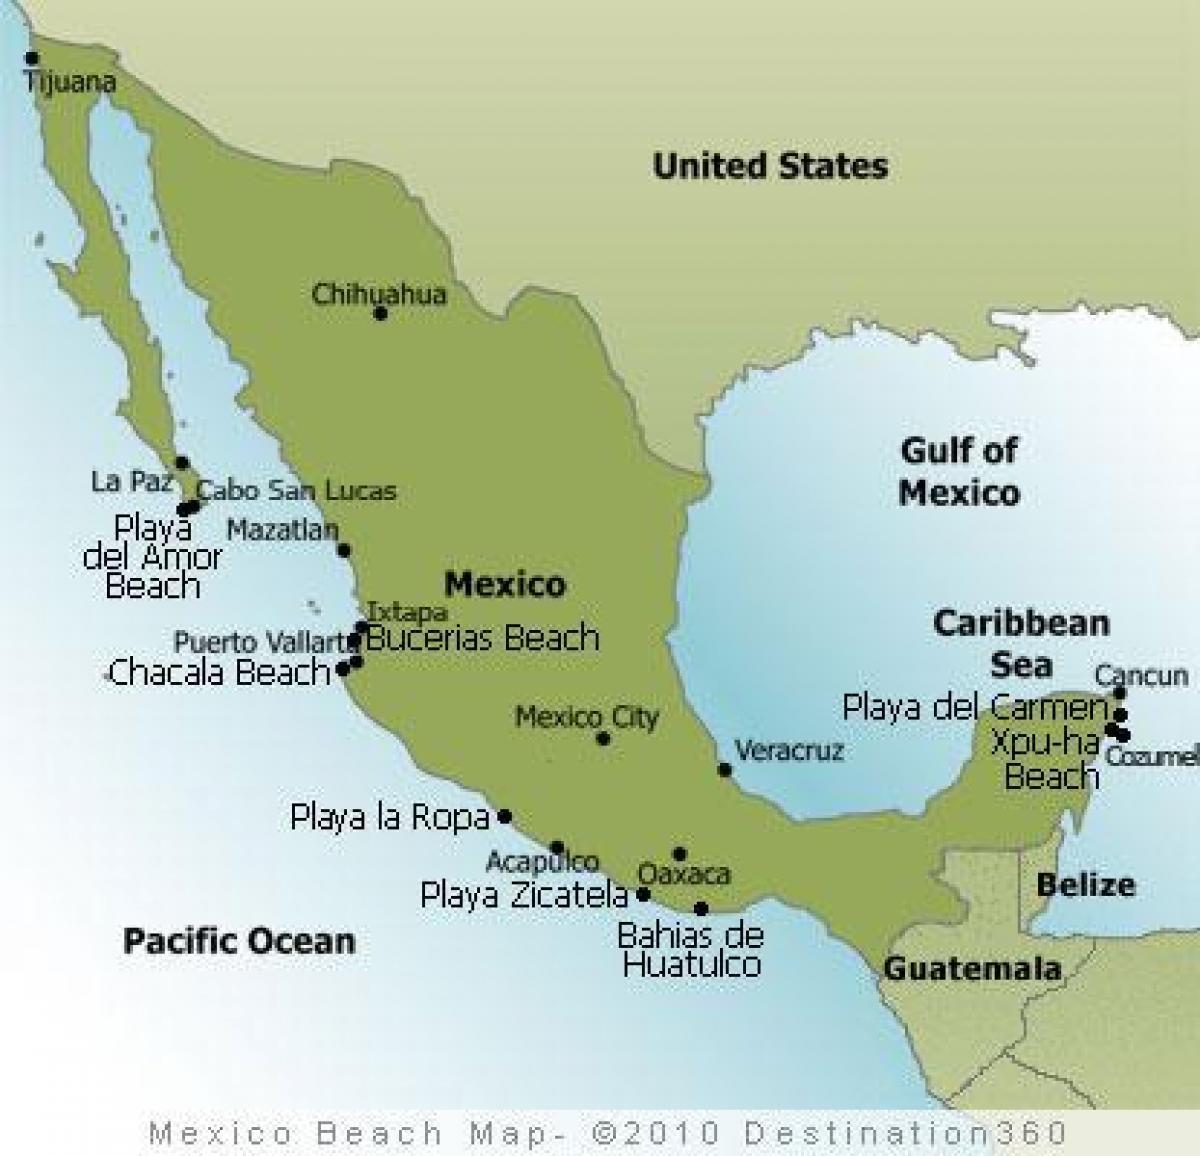 Mexico east coast map East coast Mexico map Central America